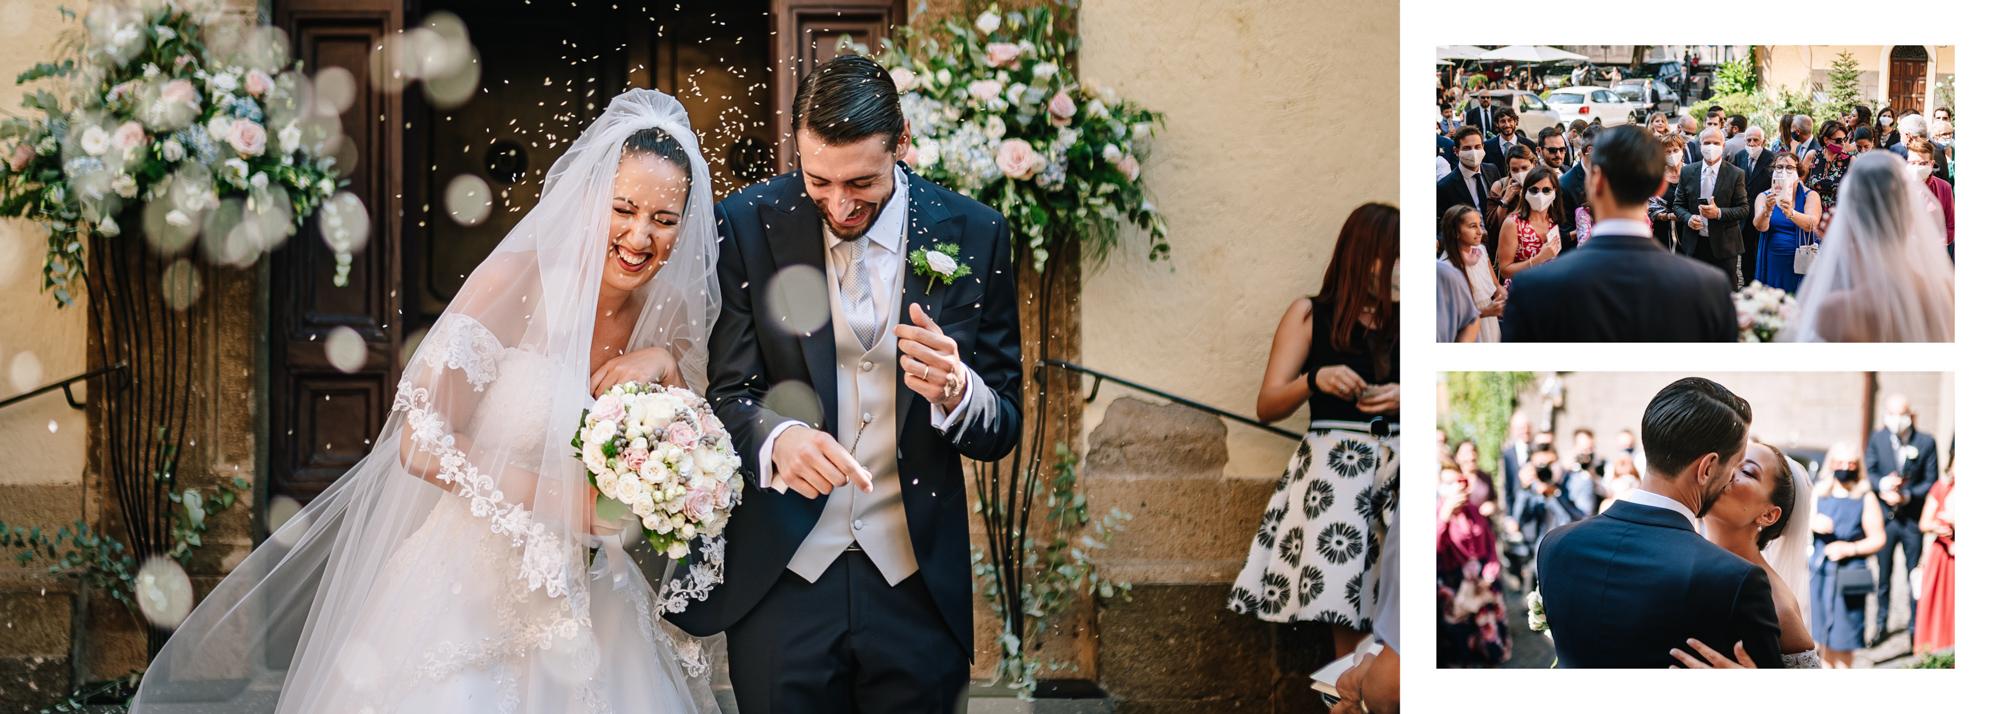 uscita sposi matrimonio frascati